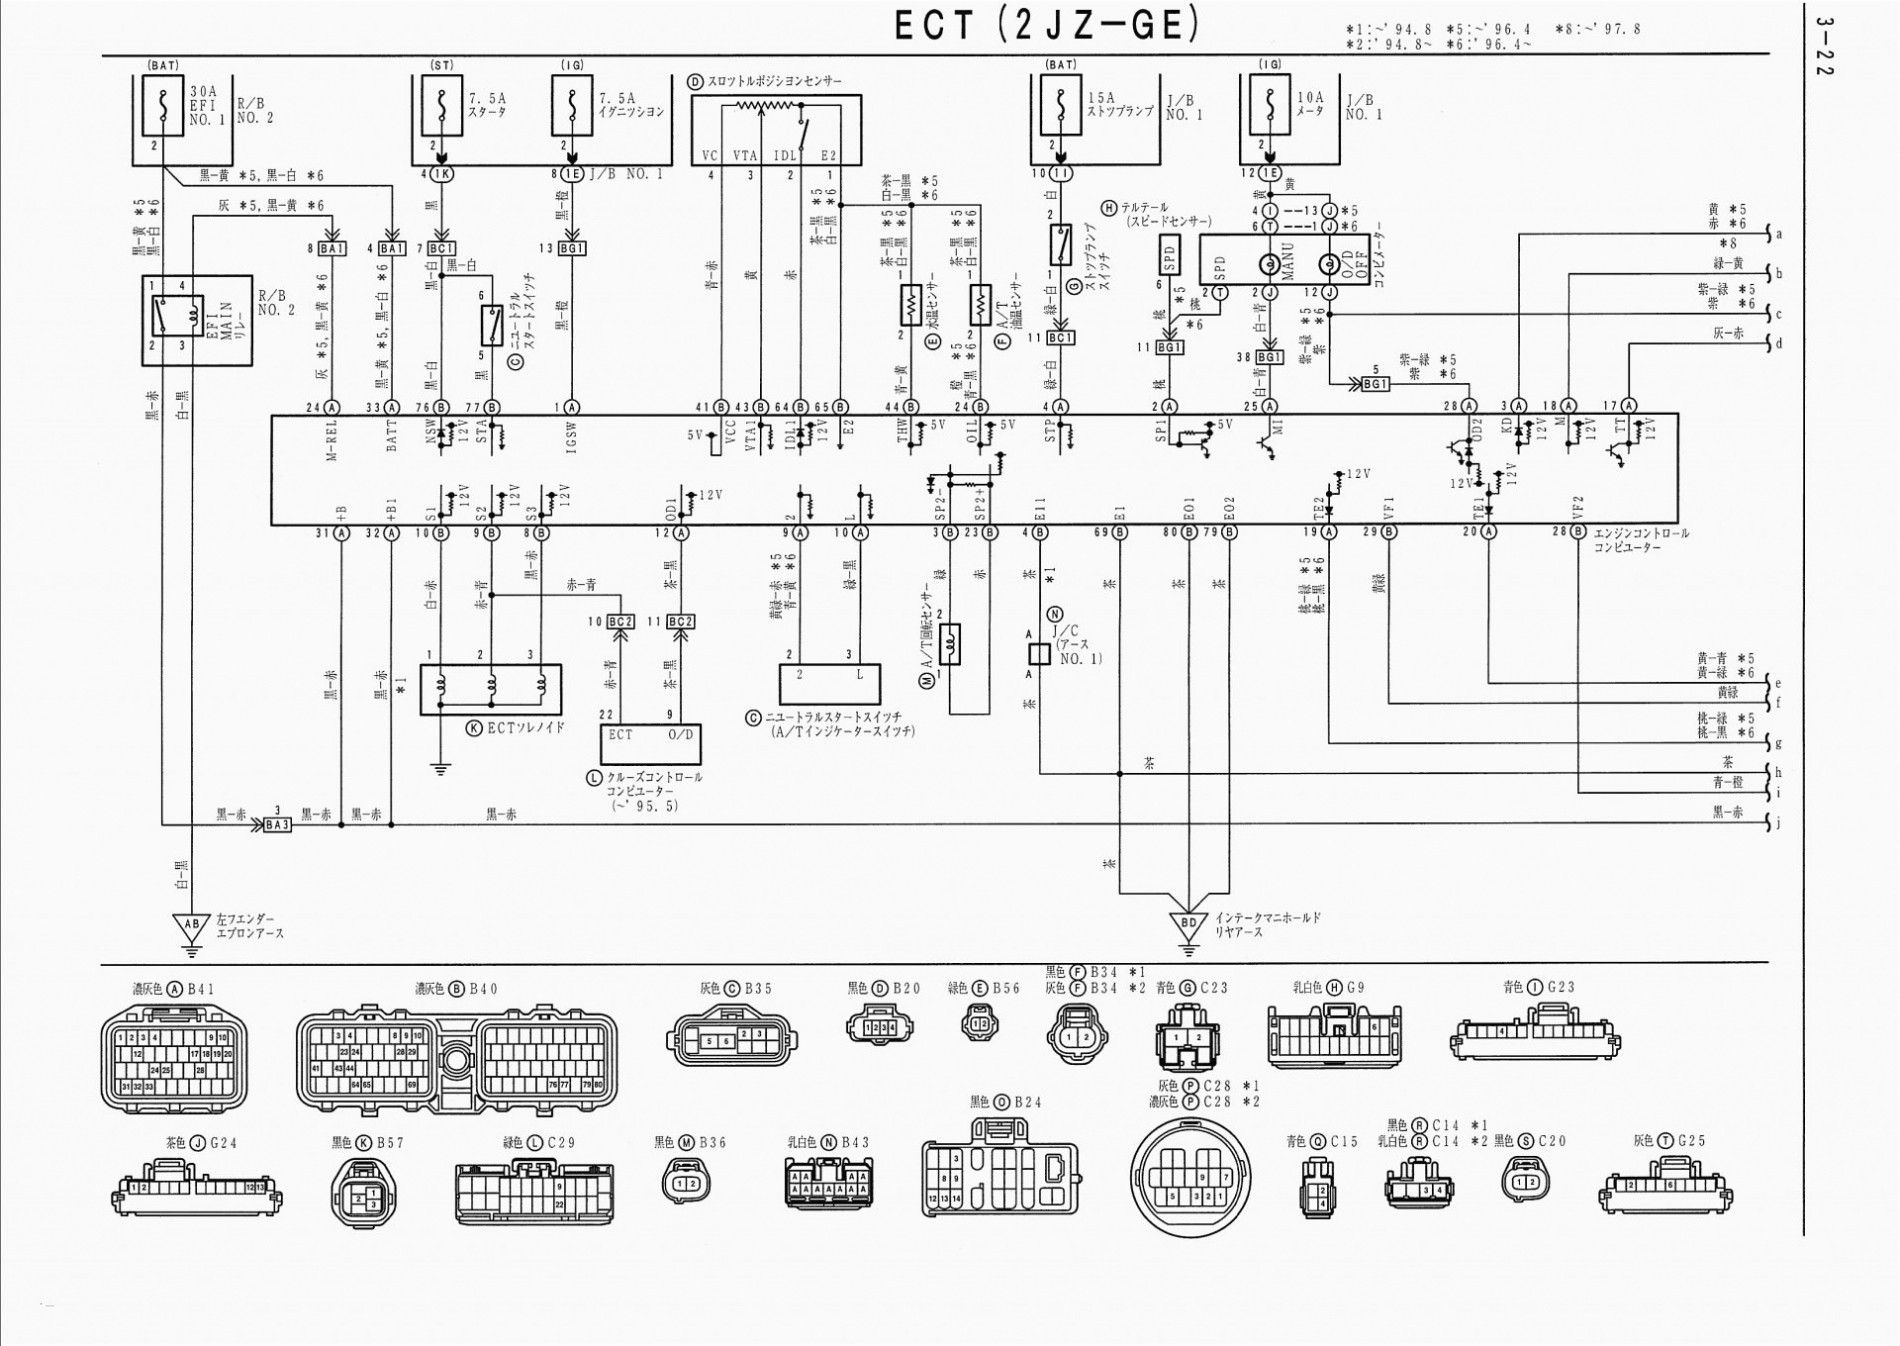 Unique Wiring Diagram For Club Car Batteries Diagram Diagram Chart Diagram Design